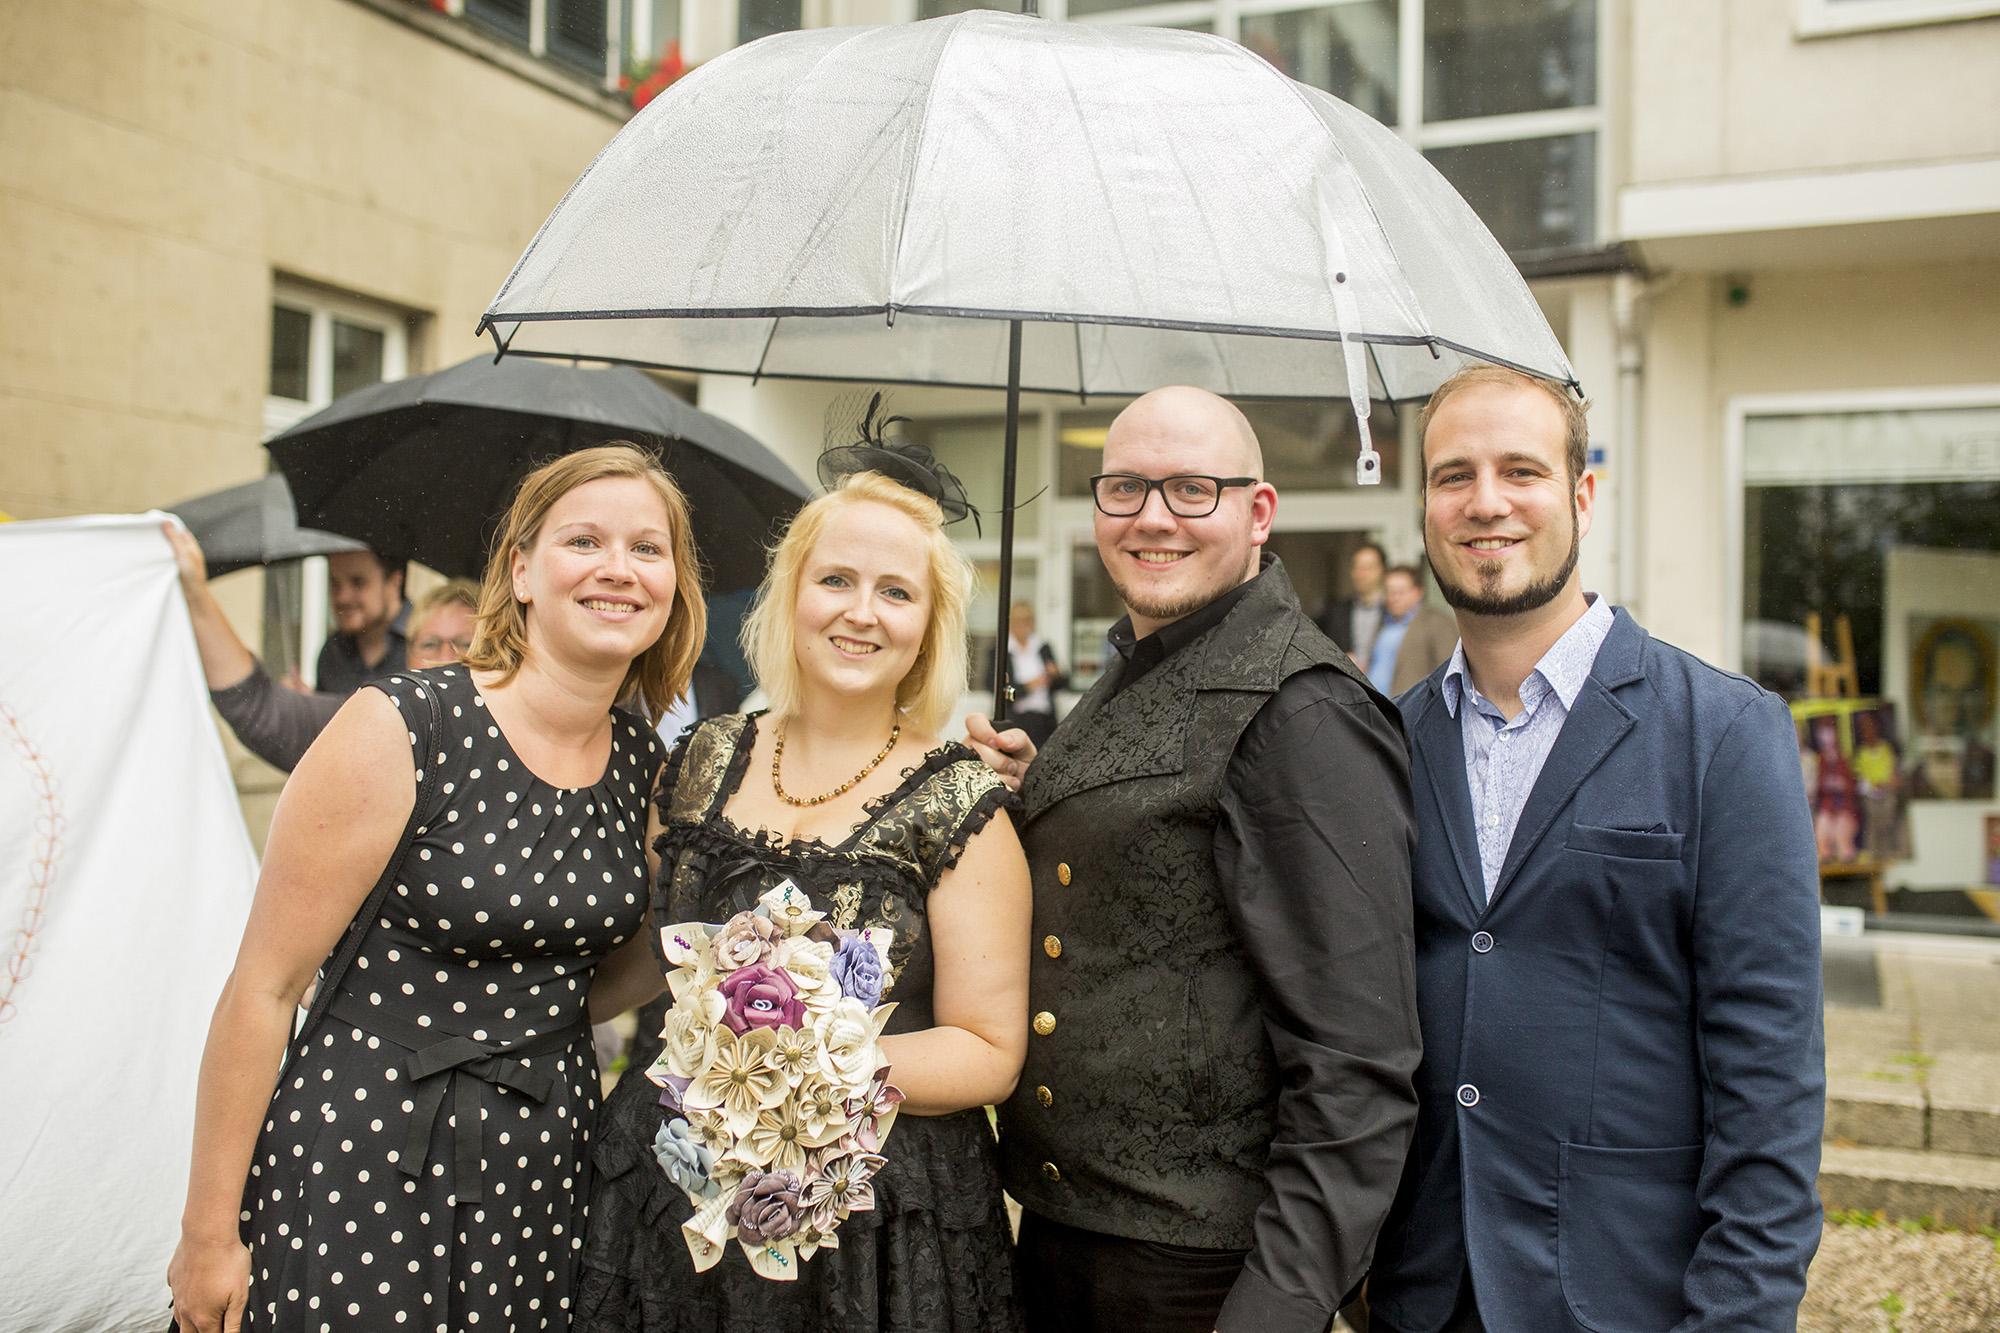 Seriously_Sabrina_Photography_Essen_Germany_RocknRoll_Hochzeit_Wedding_PatrickJenny51.jpg